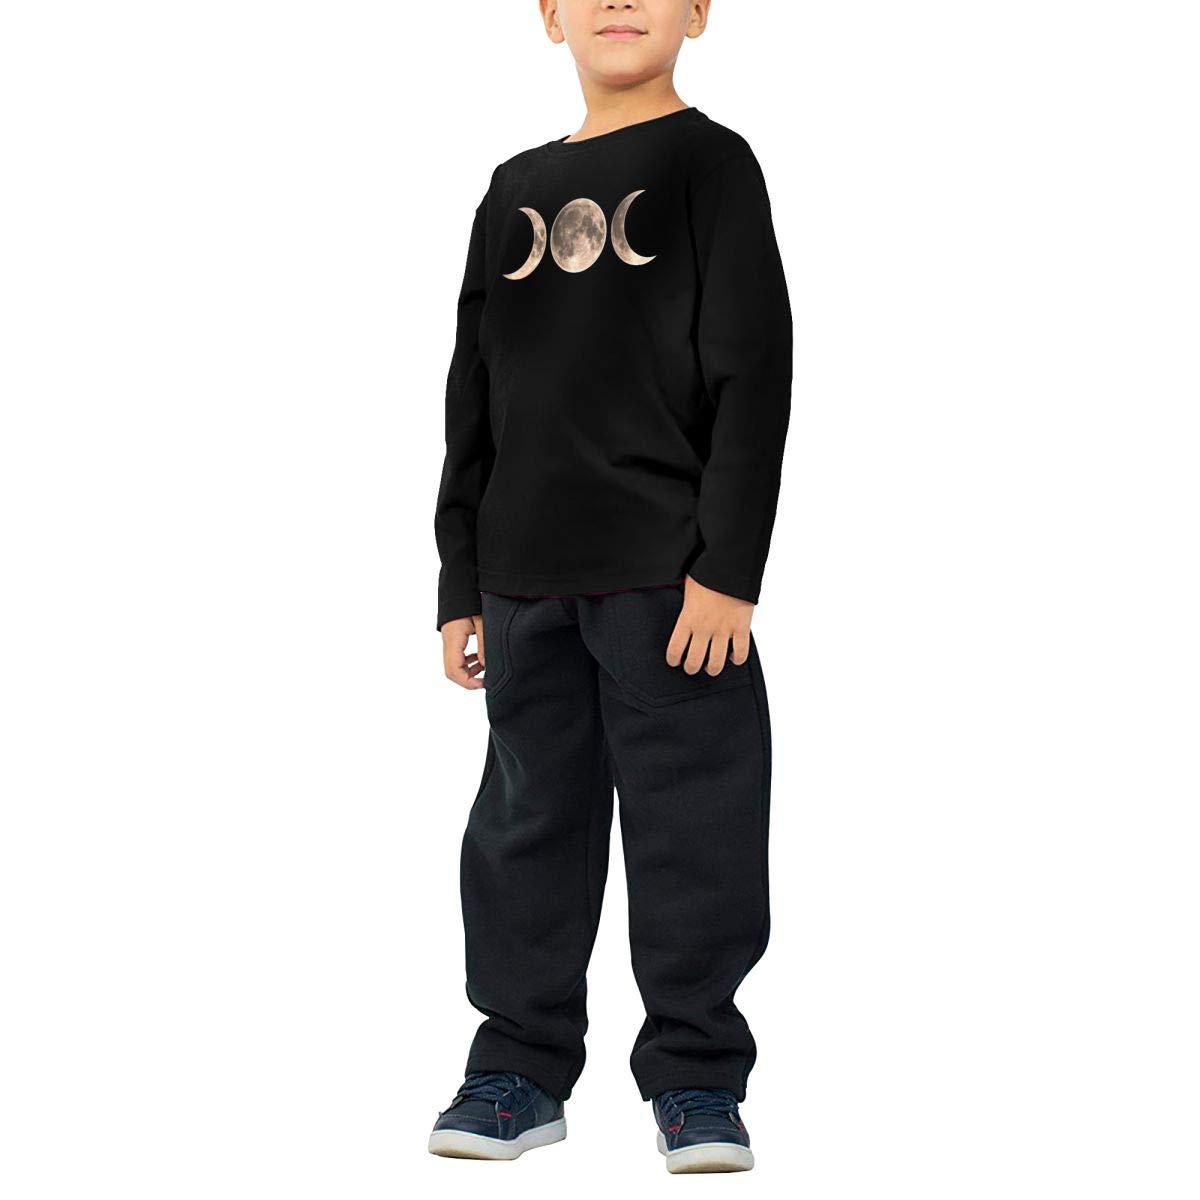 The Goddess Triple Moon Boys Cotton Long Sleeve Tshirt